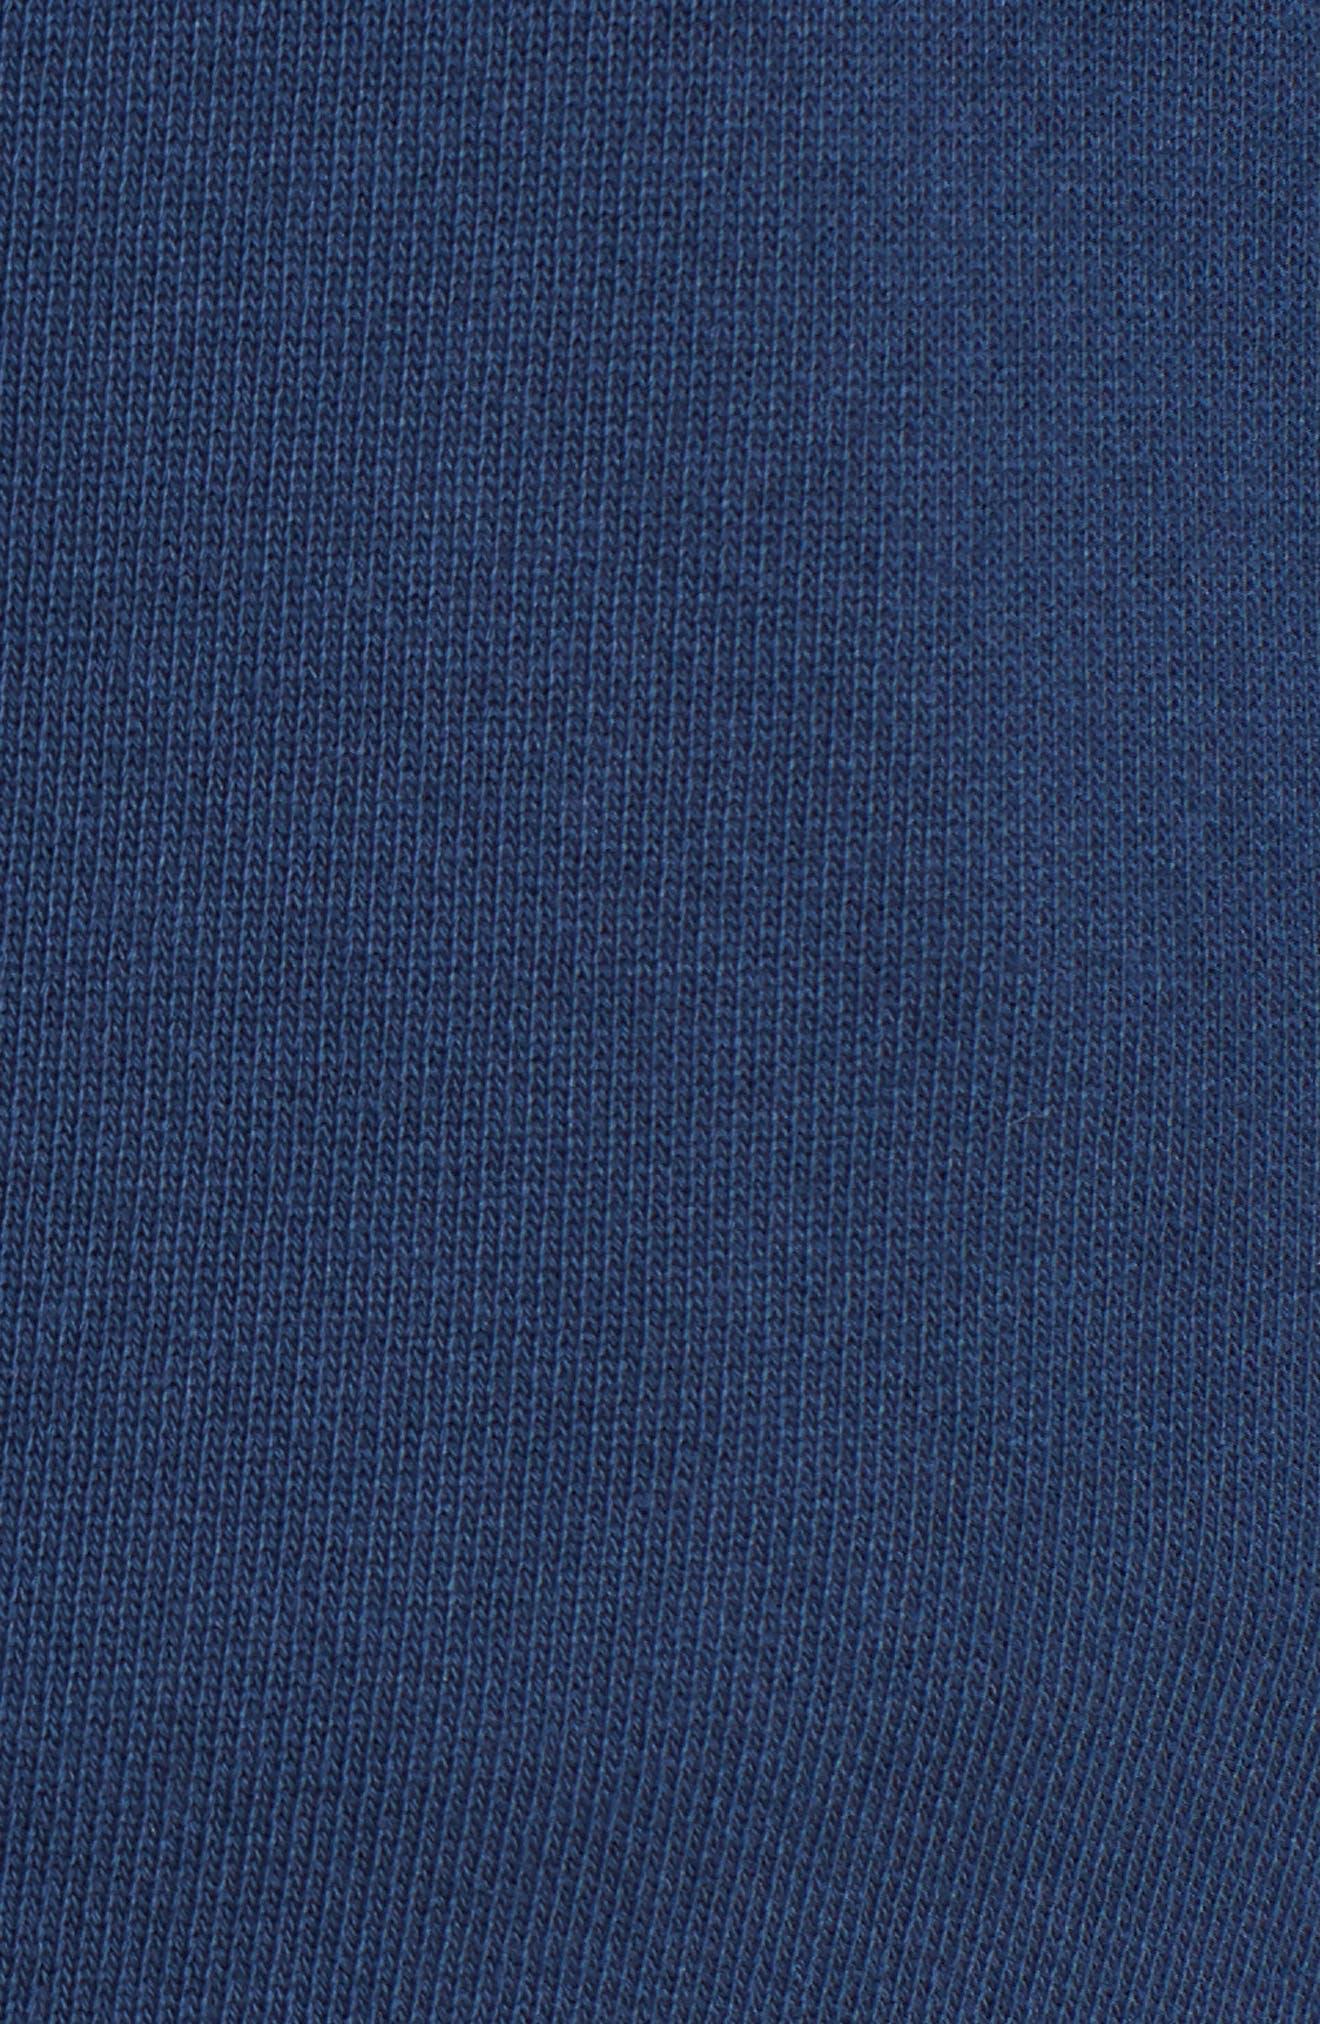 Raw Hem Crop Sweatpants,                             Alternate thumbnail 6, color,                             410